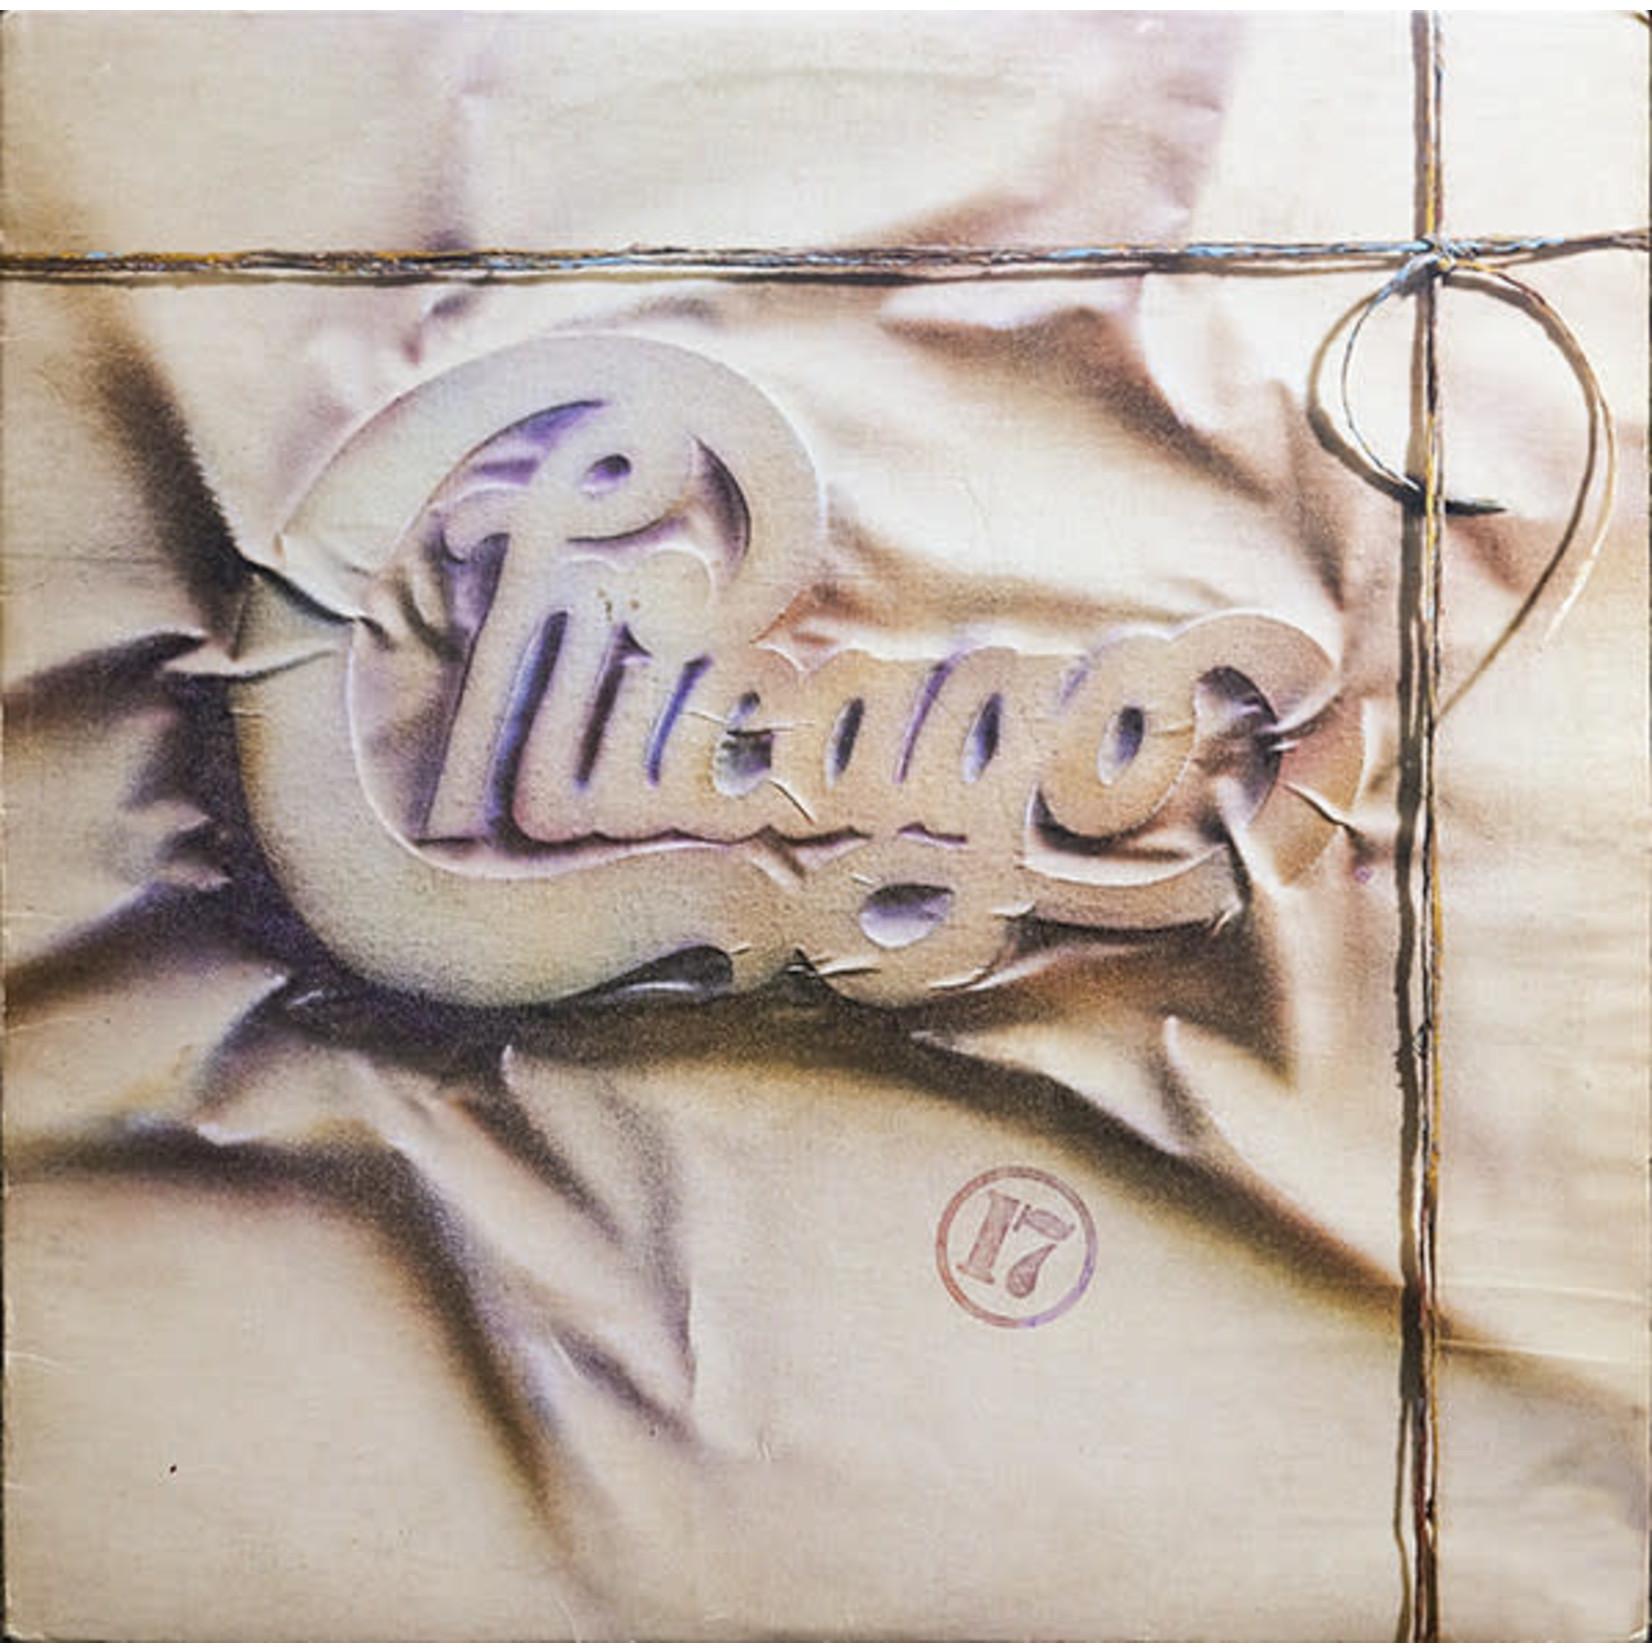 [Vintage] Chicago: 17